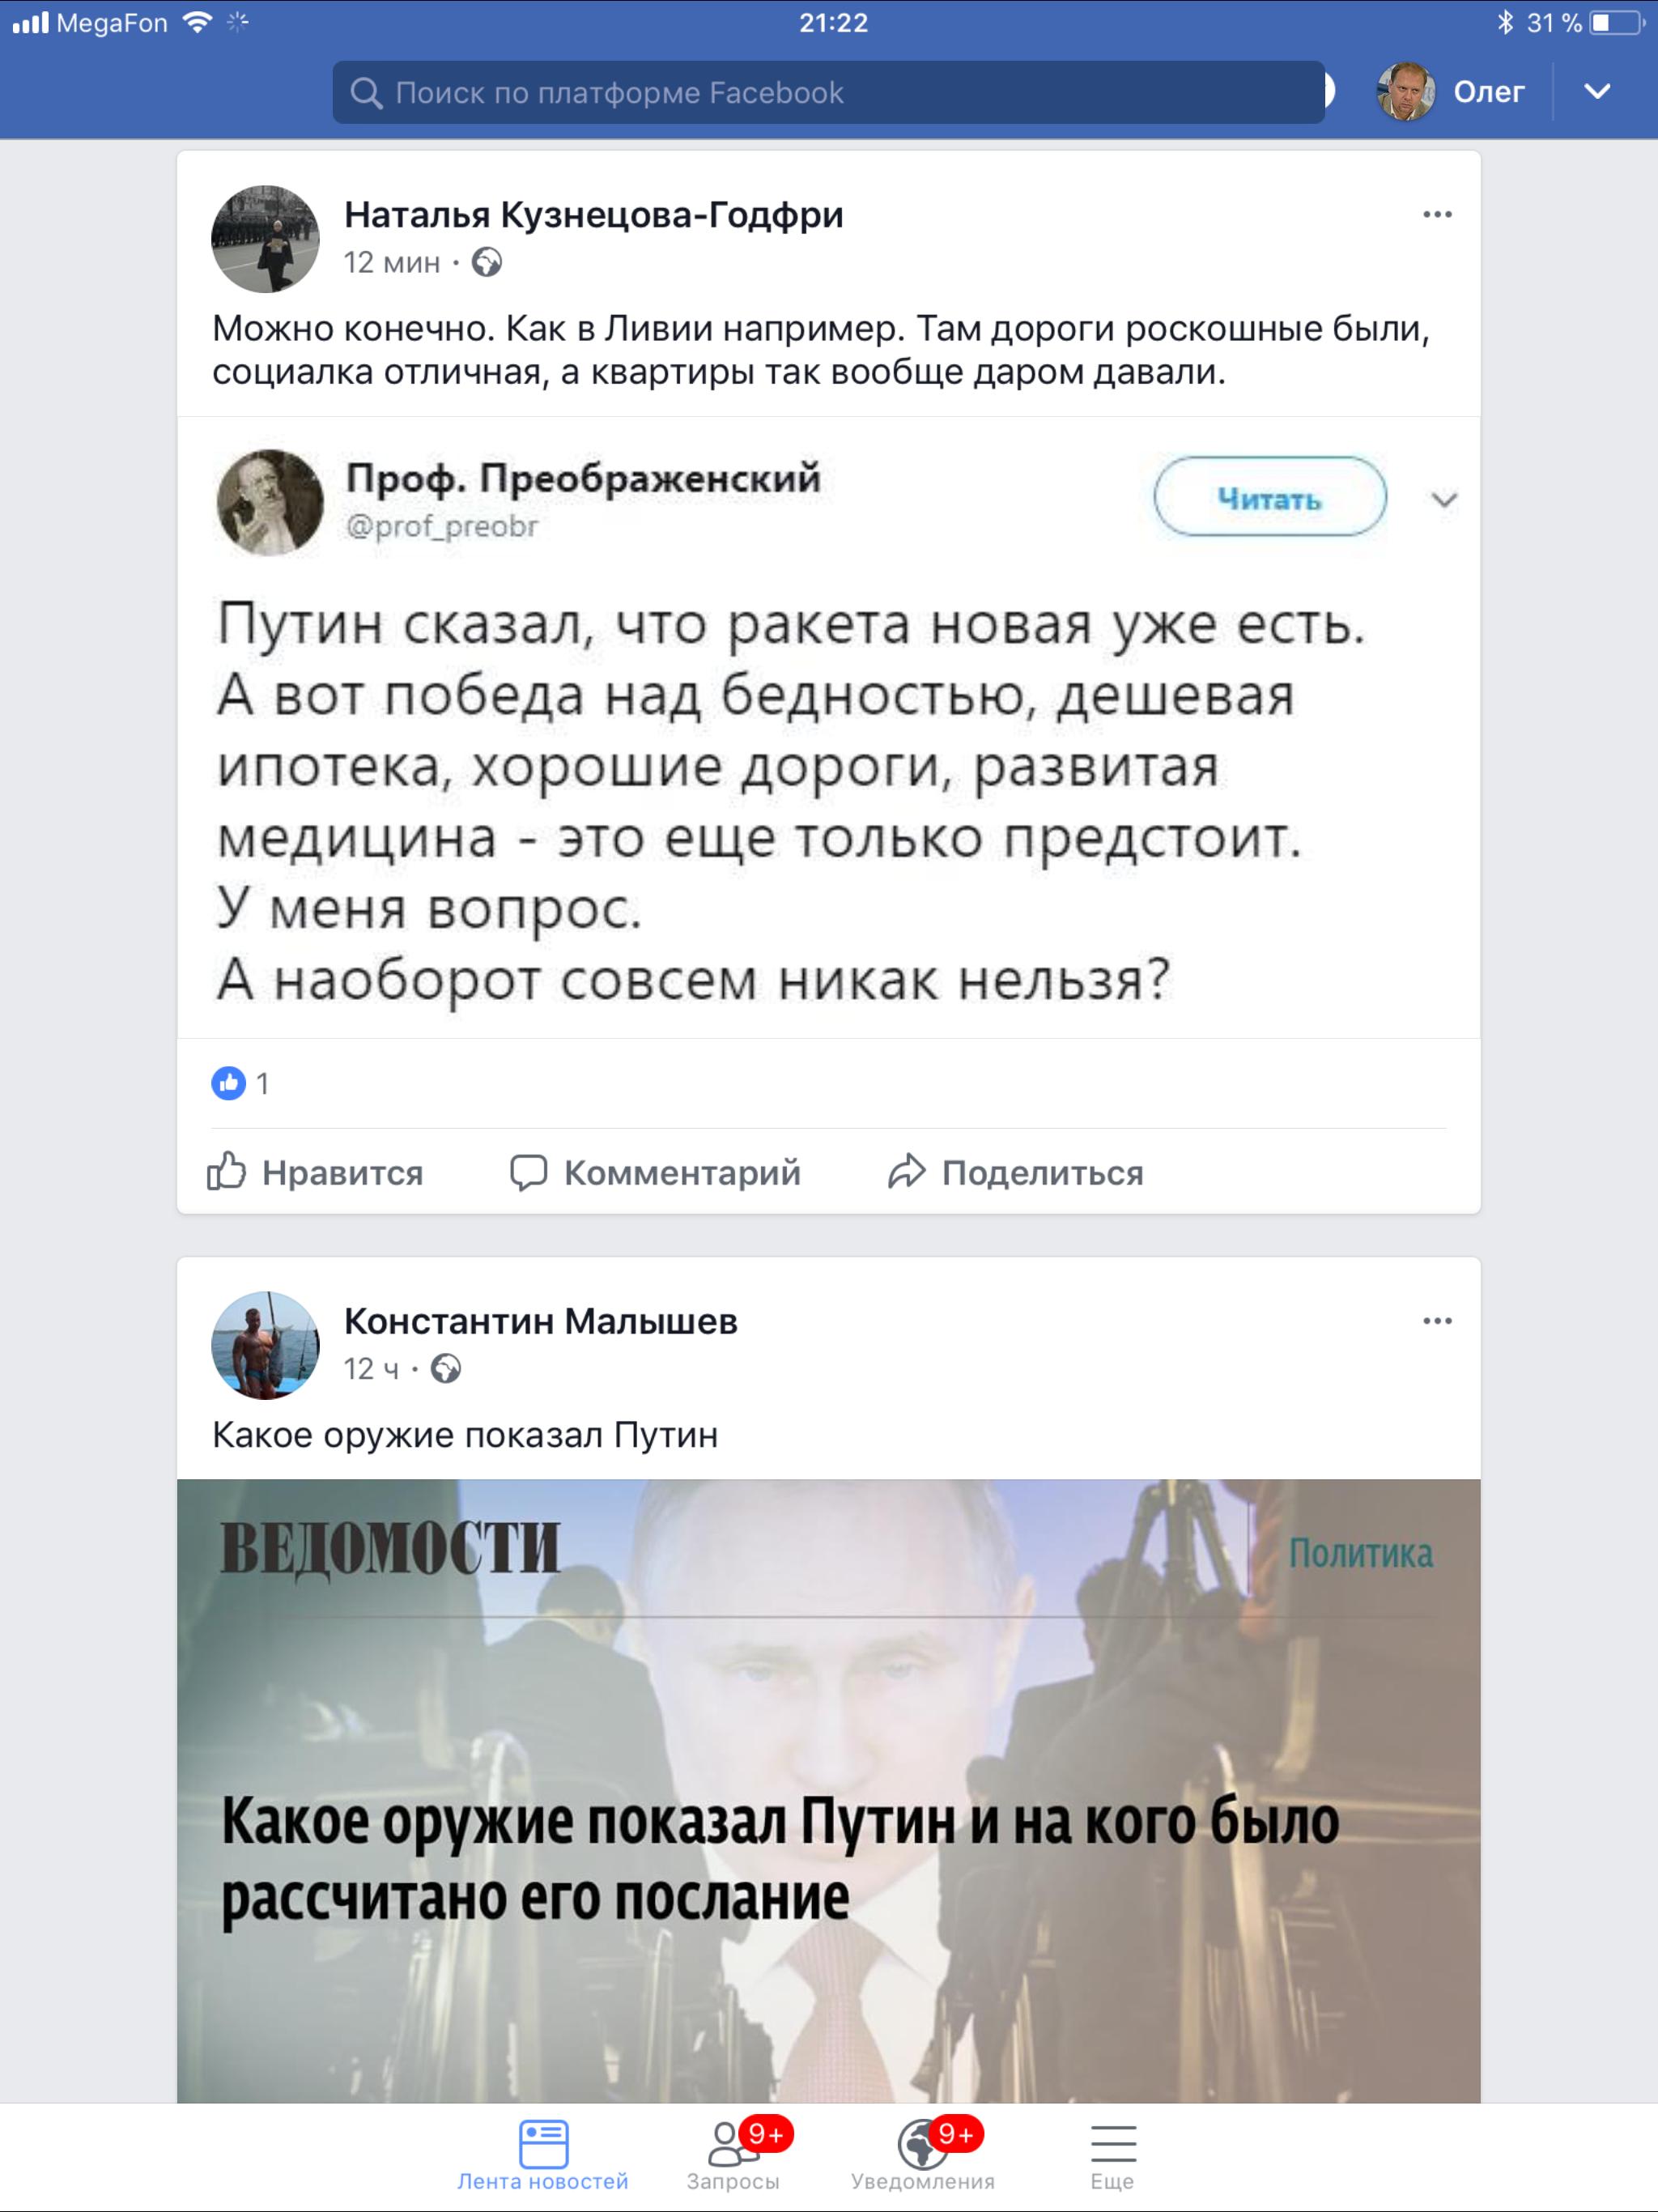 https://ic.pics.livejournal.com/matveychev_oleg/27303223/9318607/9318607_original.png